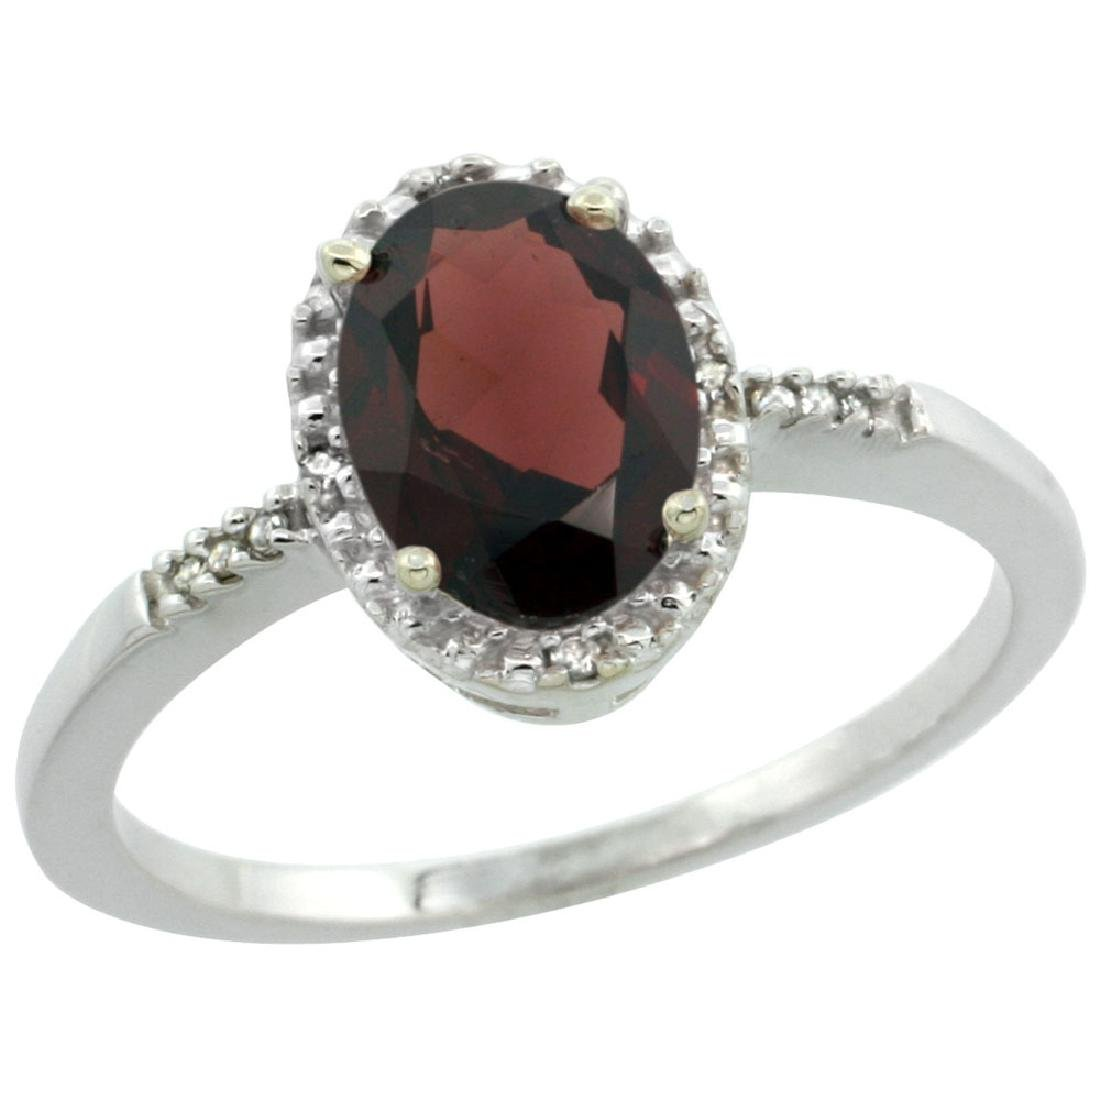 Natural 1.2 ctw Garnet & Diamond Engagement Ring 10K